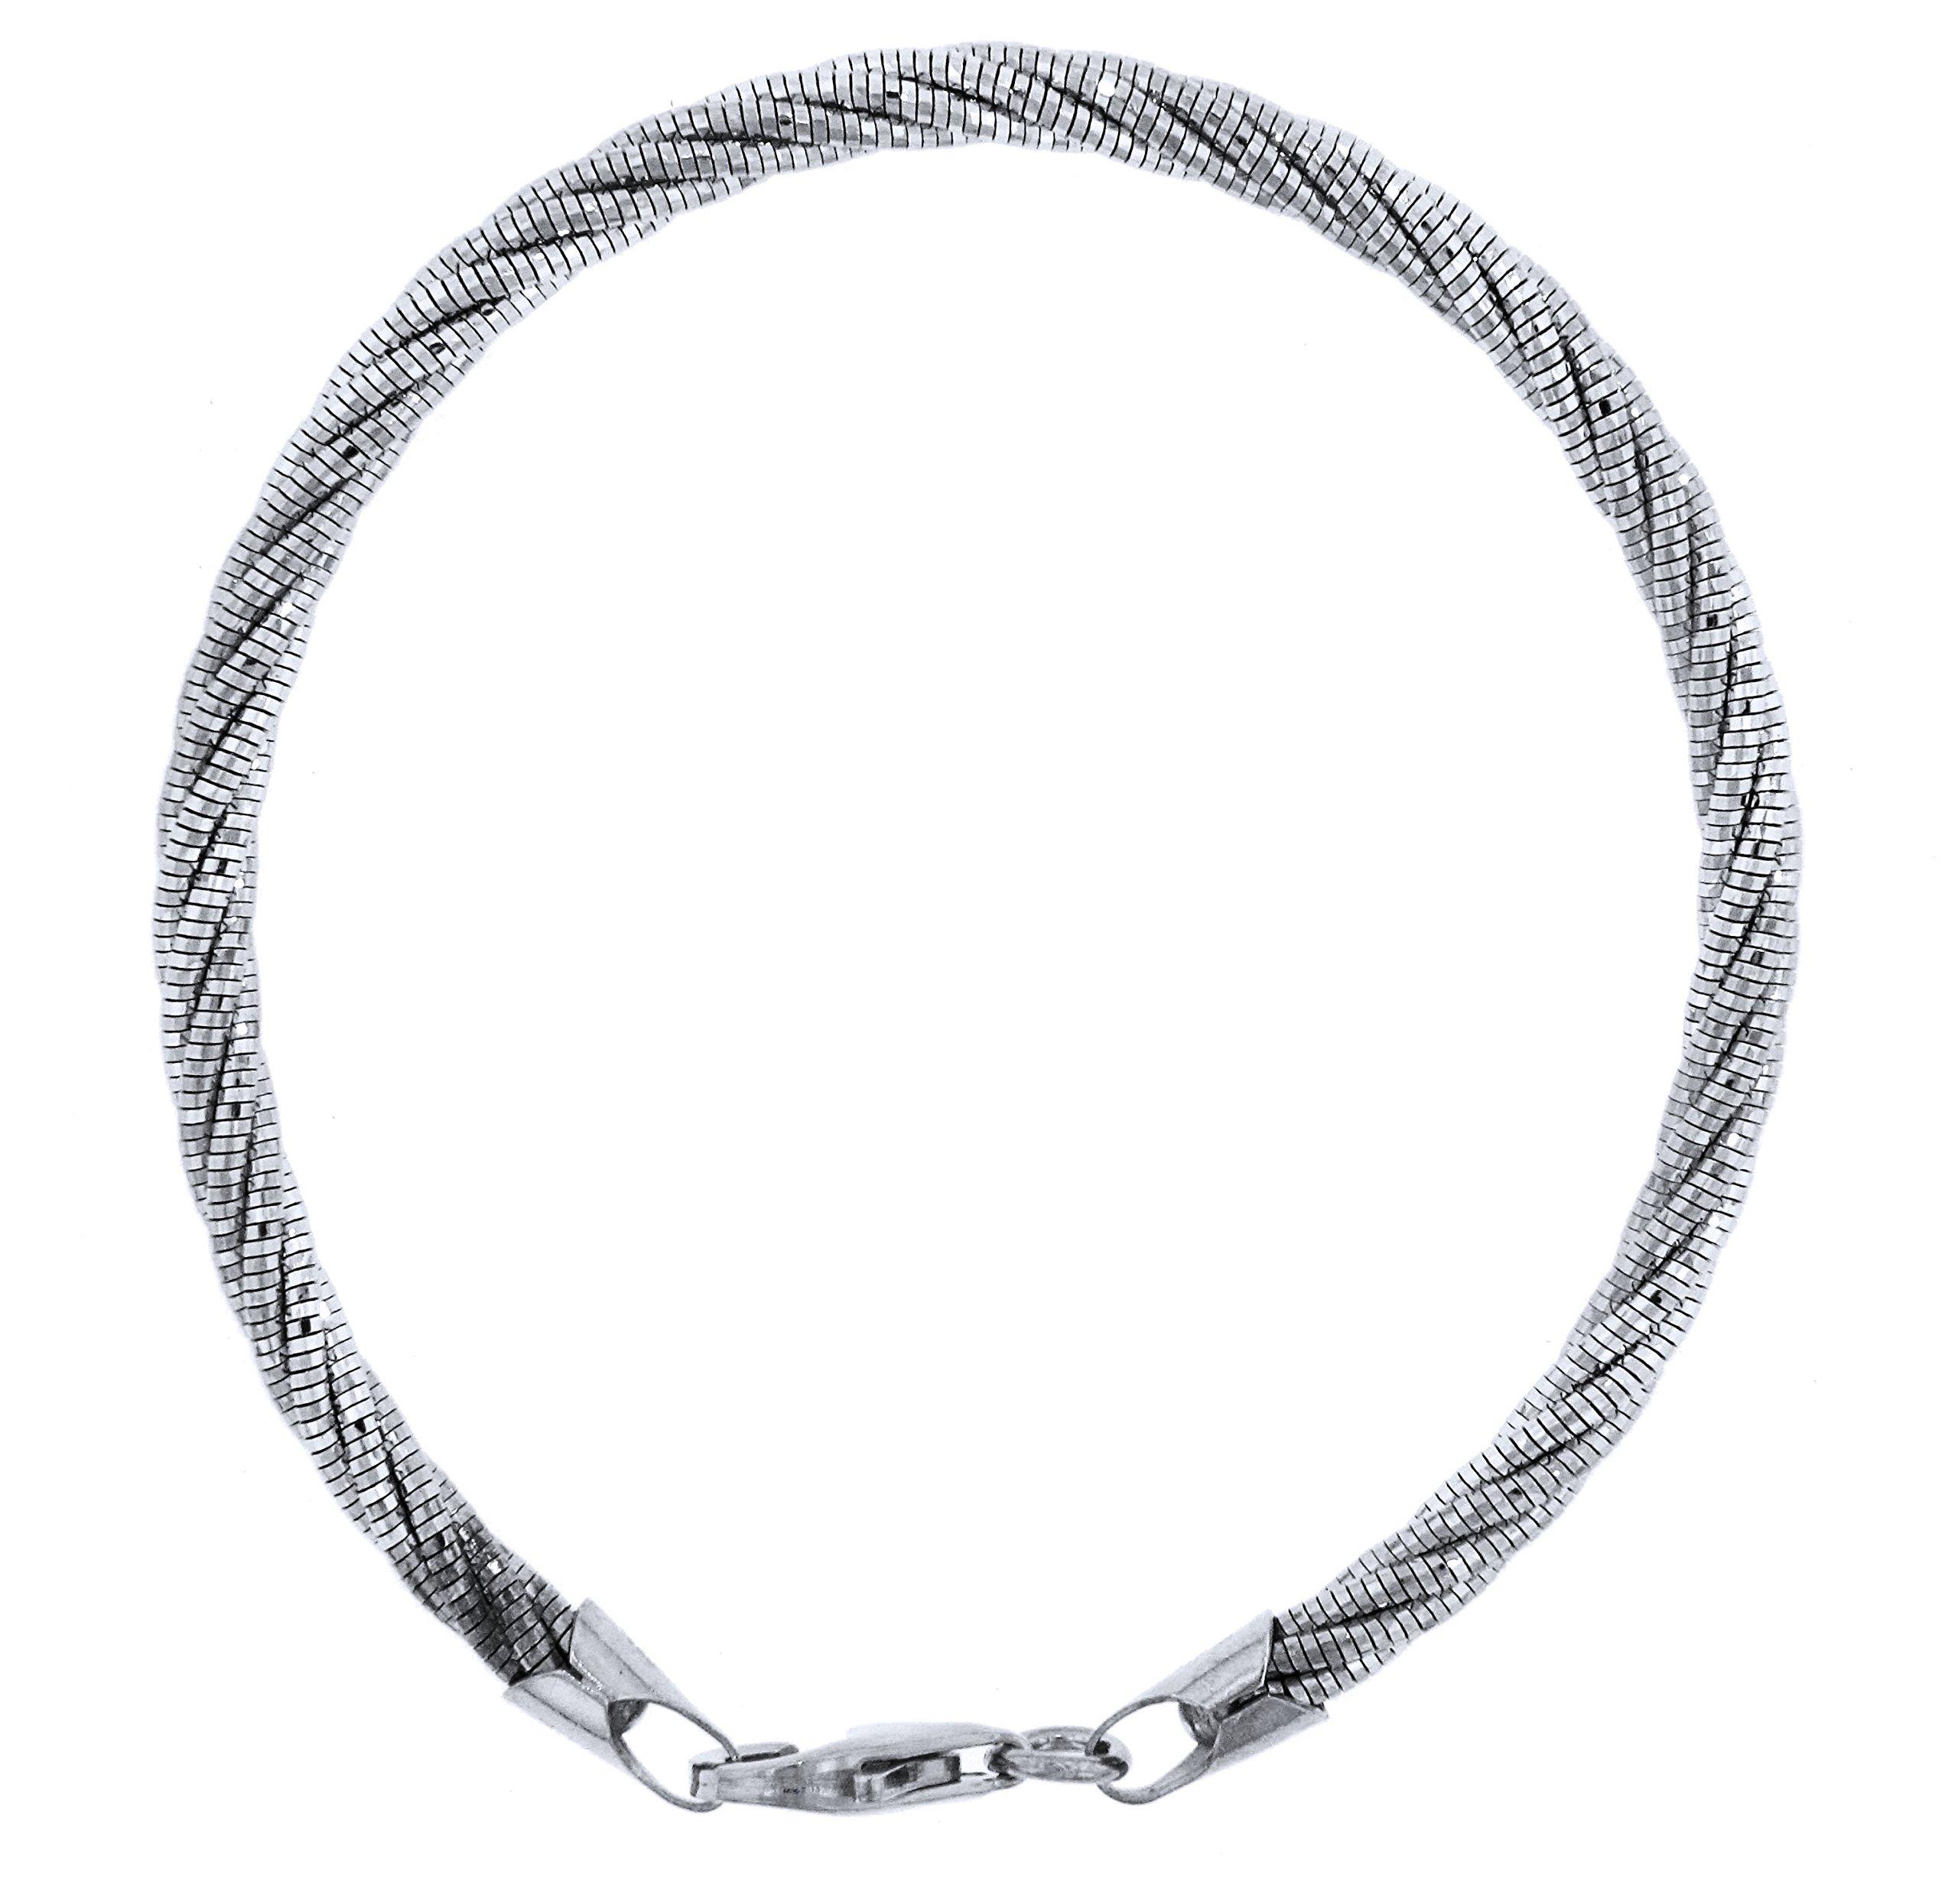 Officina Bernardi Sterling Silver 5 Row Spring Bracelet (8)